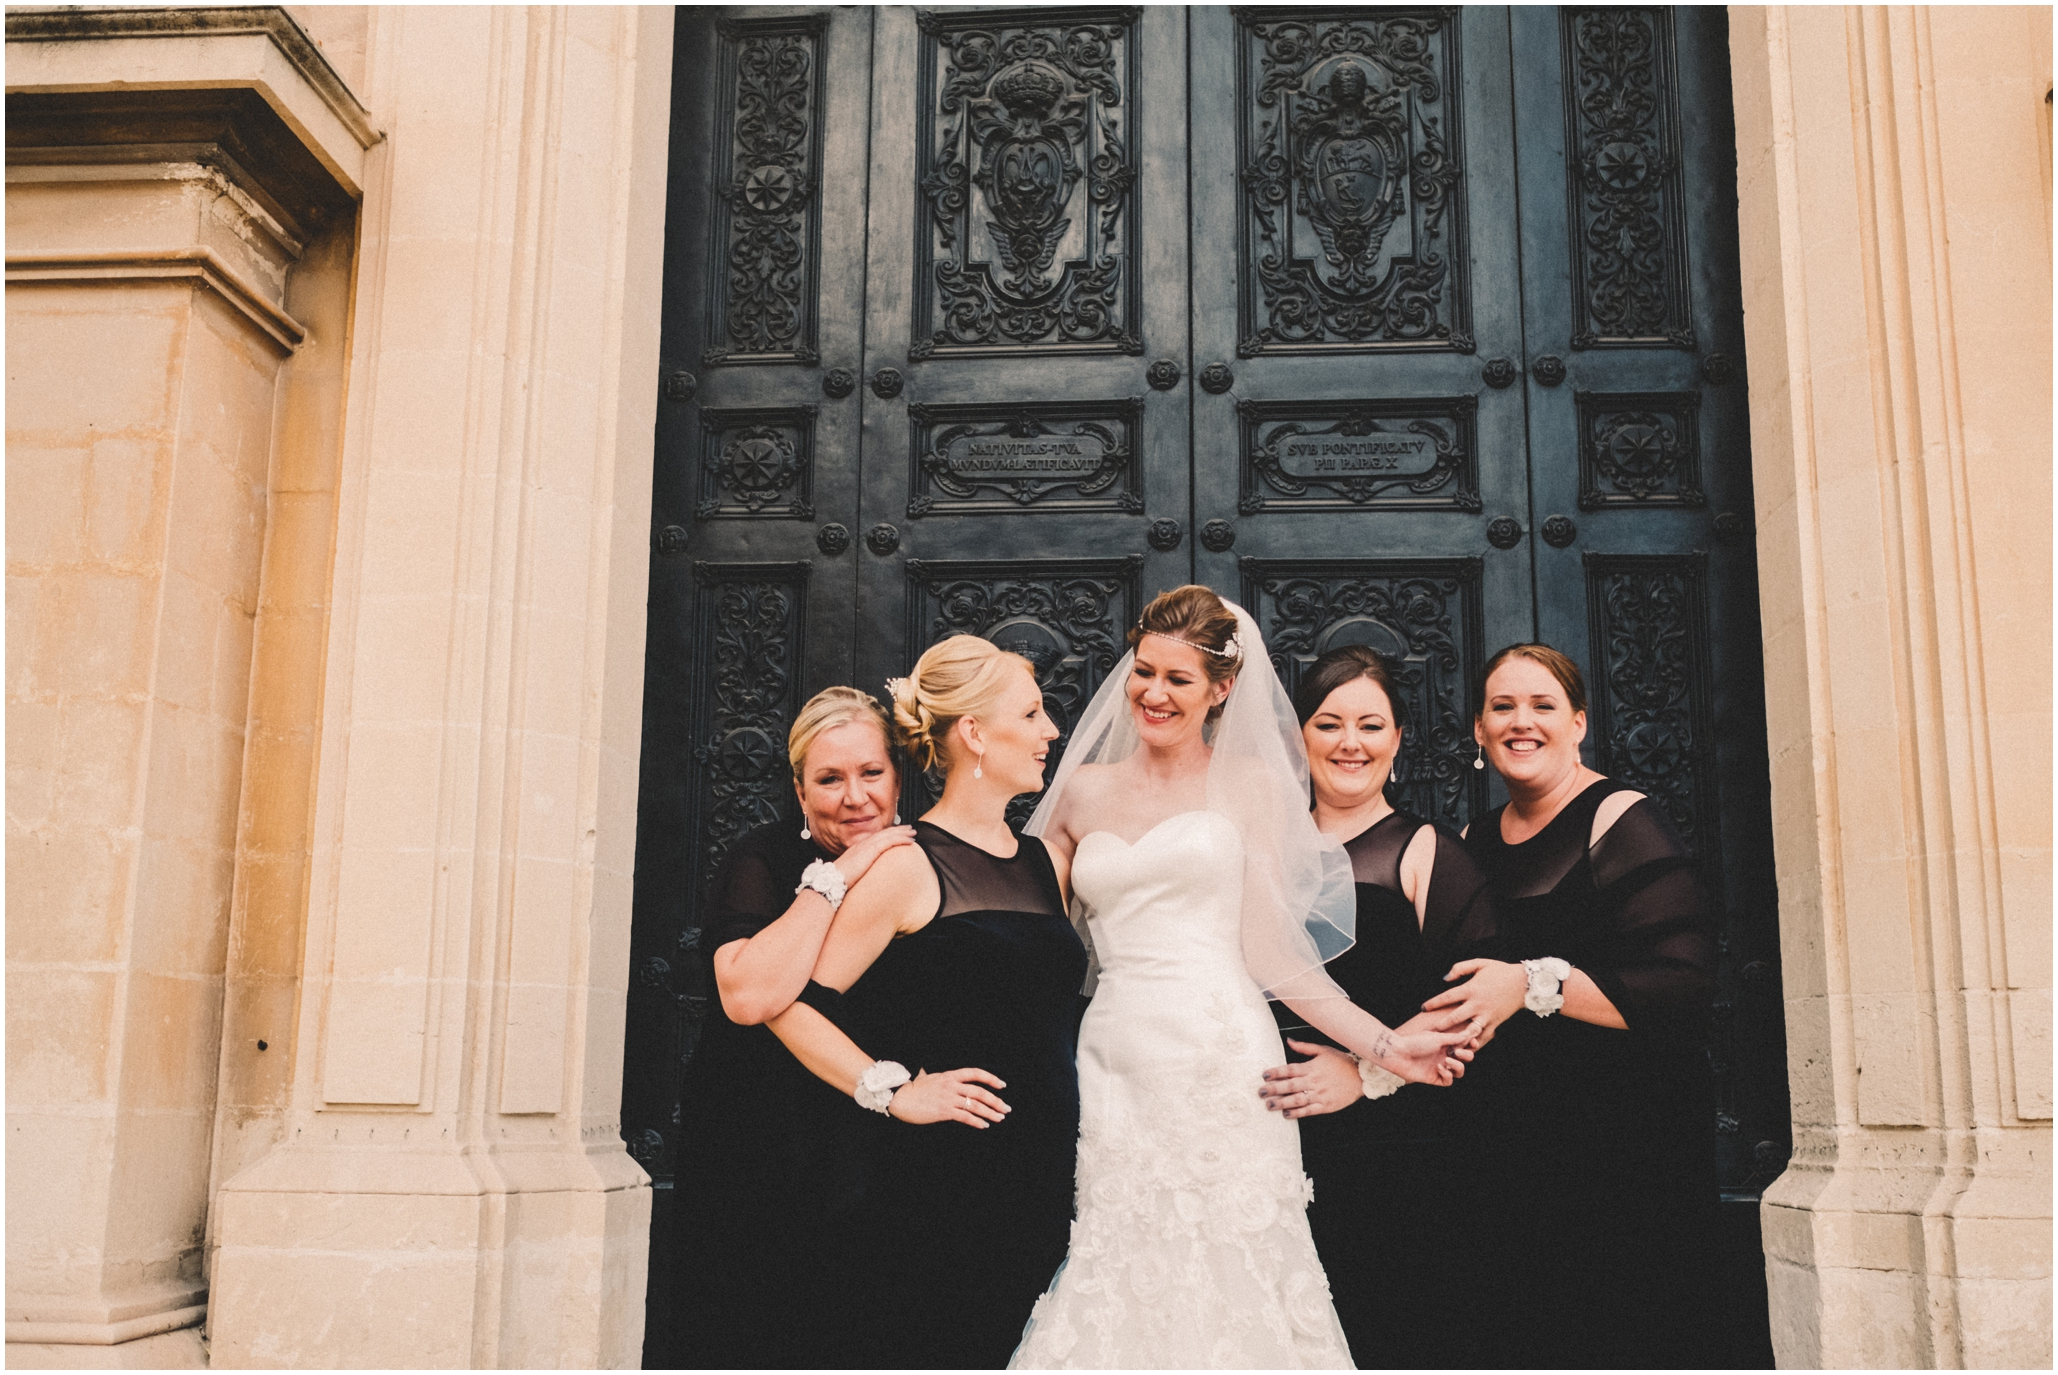 Malta Destination Wedding Photography at The Palazzo Parisio